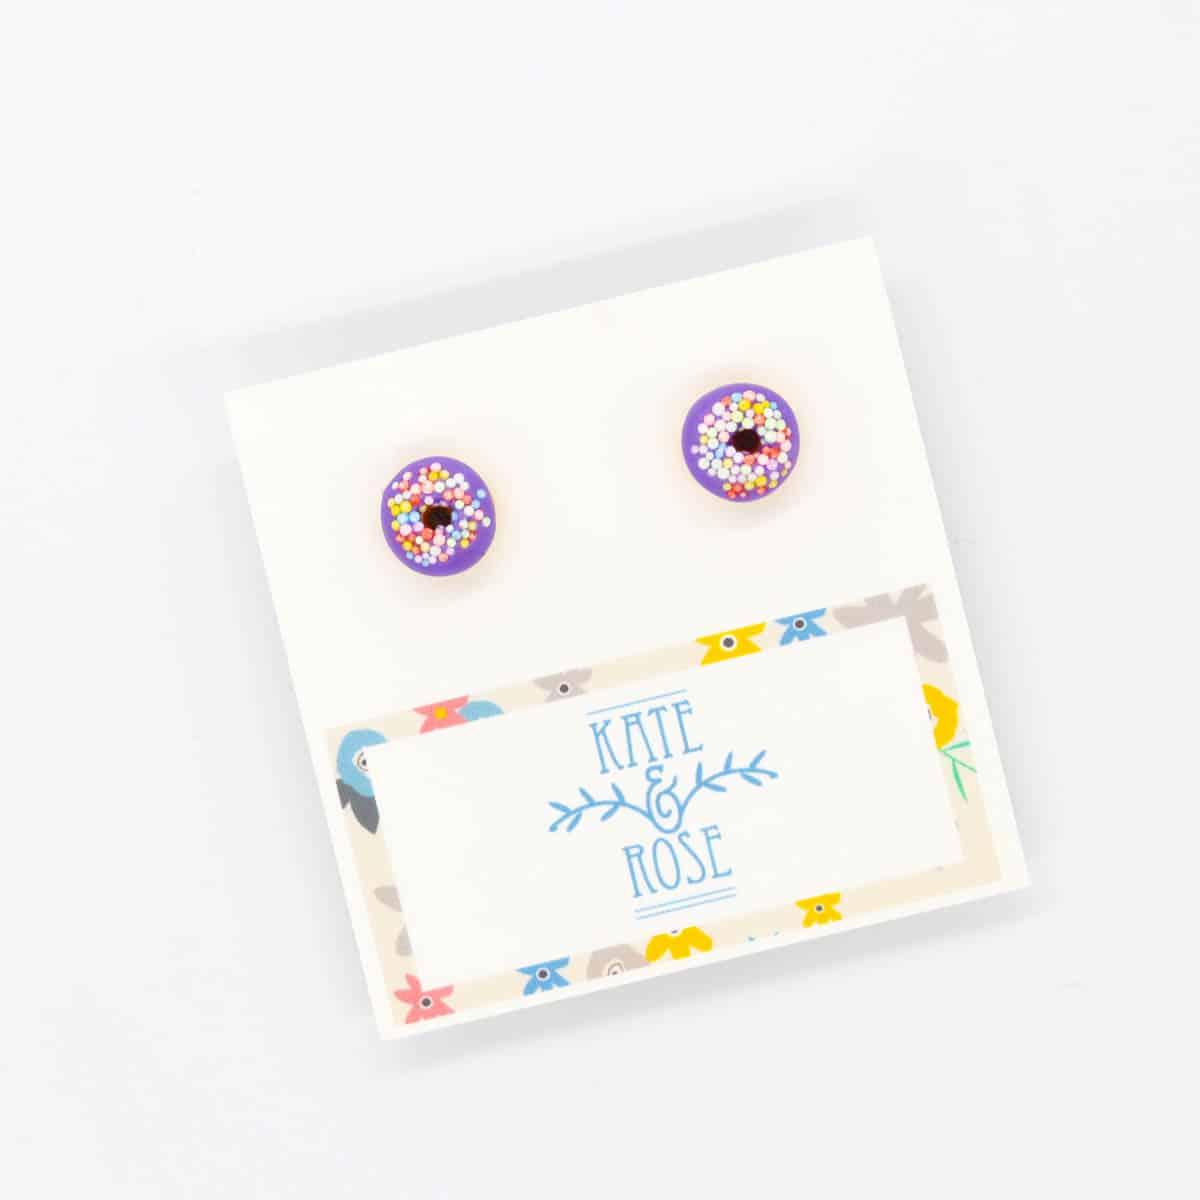 Purple Sprinkle Donut Earrings By Kate And Rose $14.95